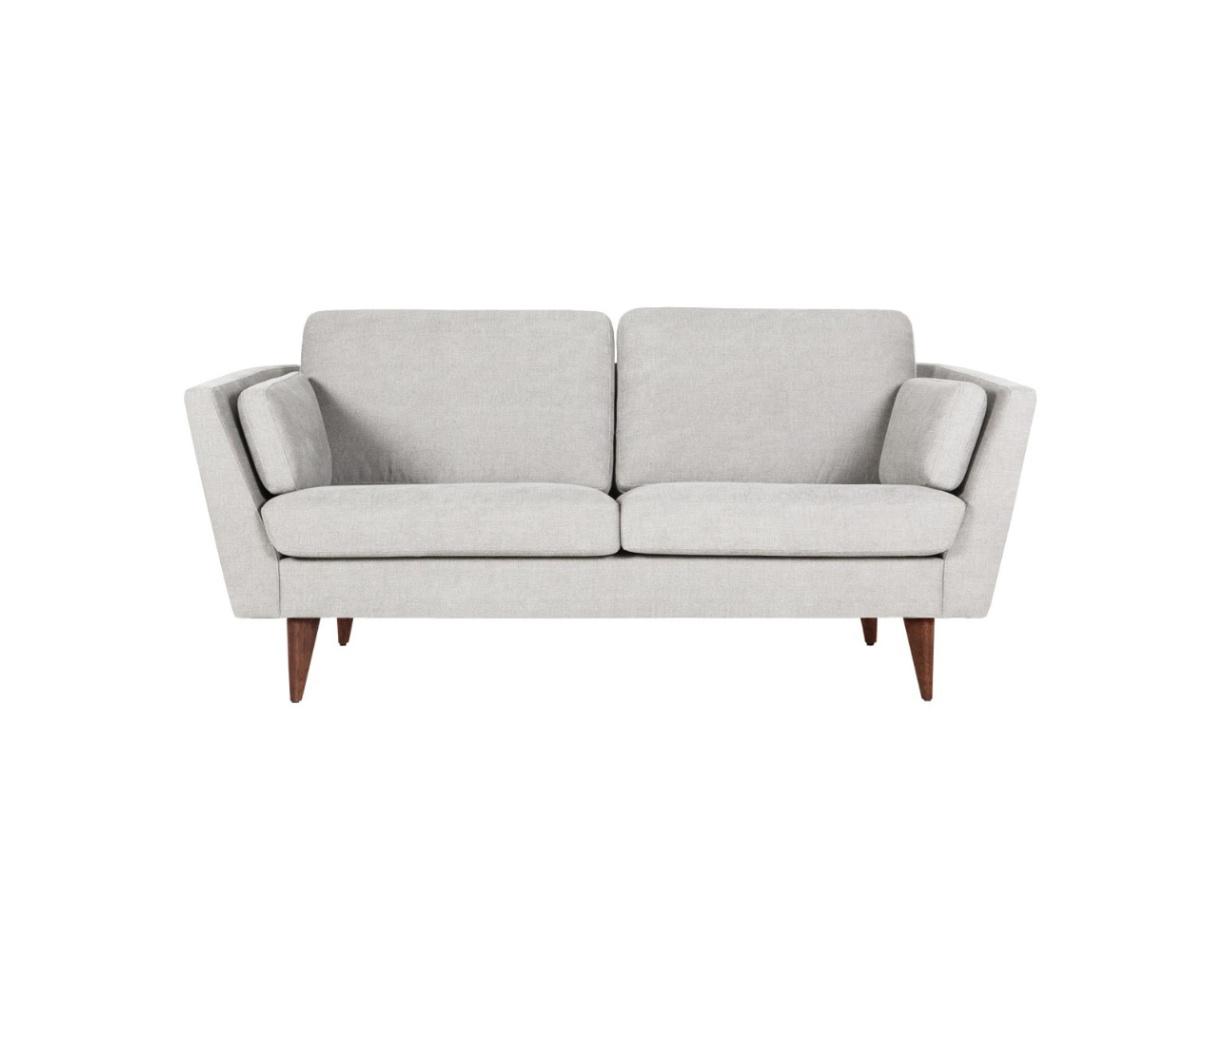 Ravenna 2 Seater Sofa-0